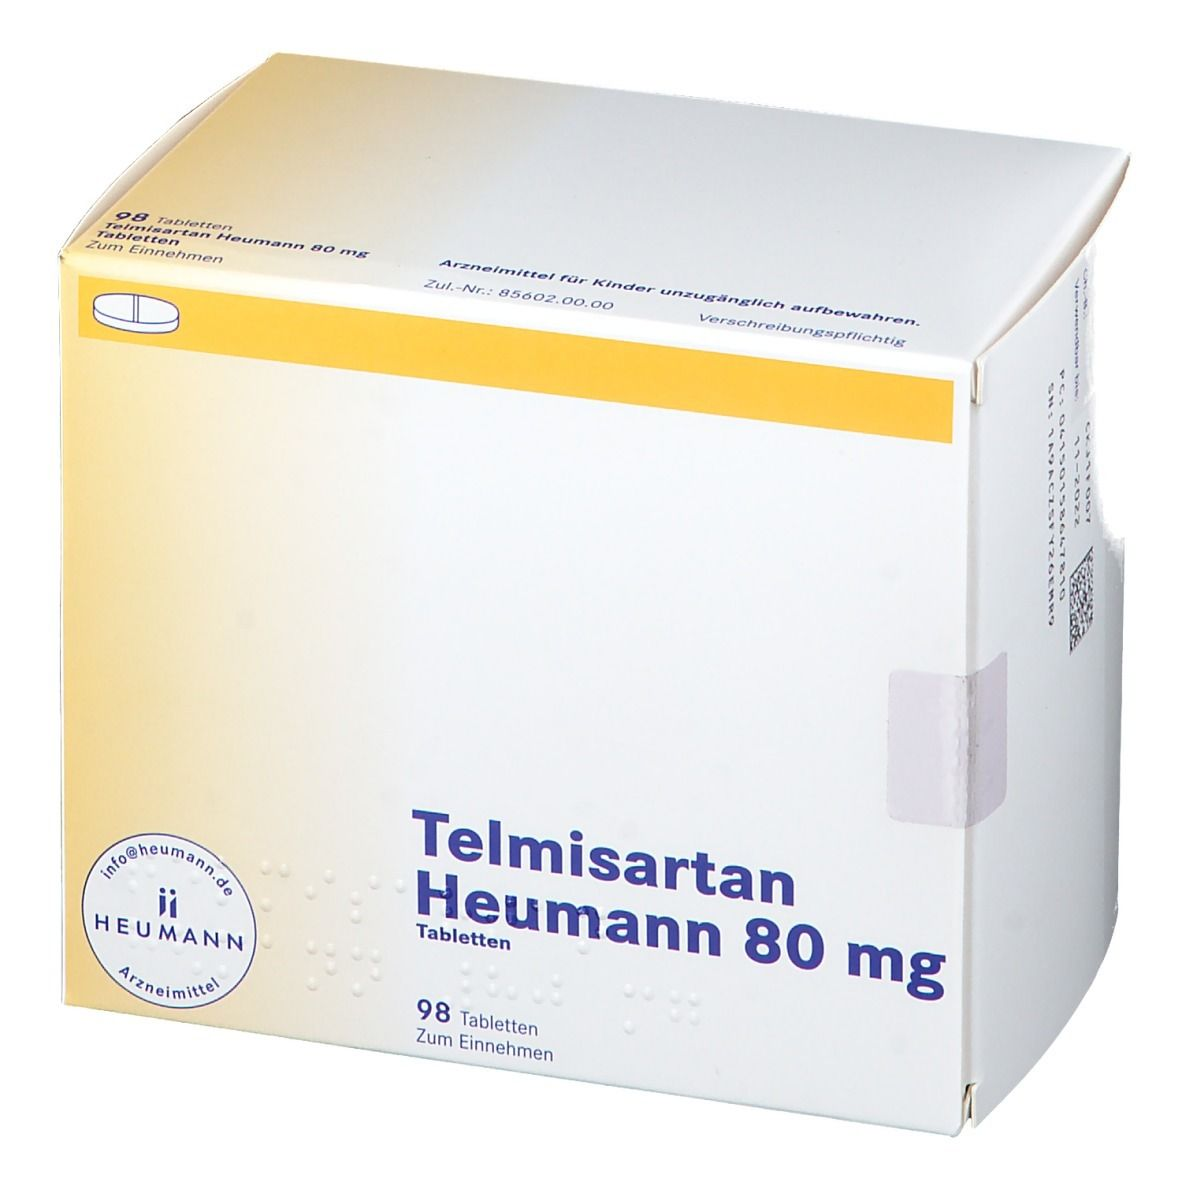 Telmisartan Heumann 80 mg